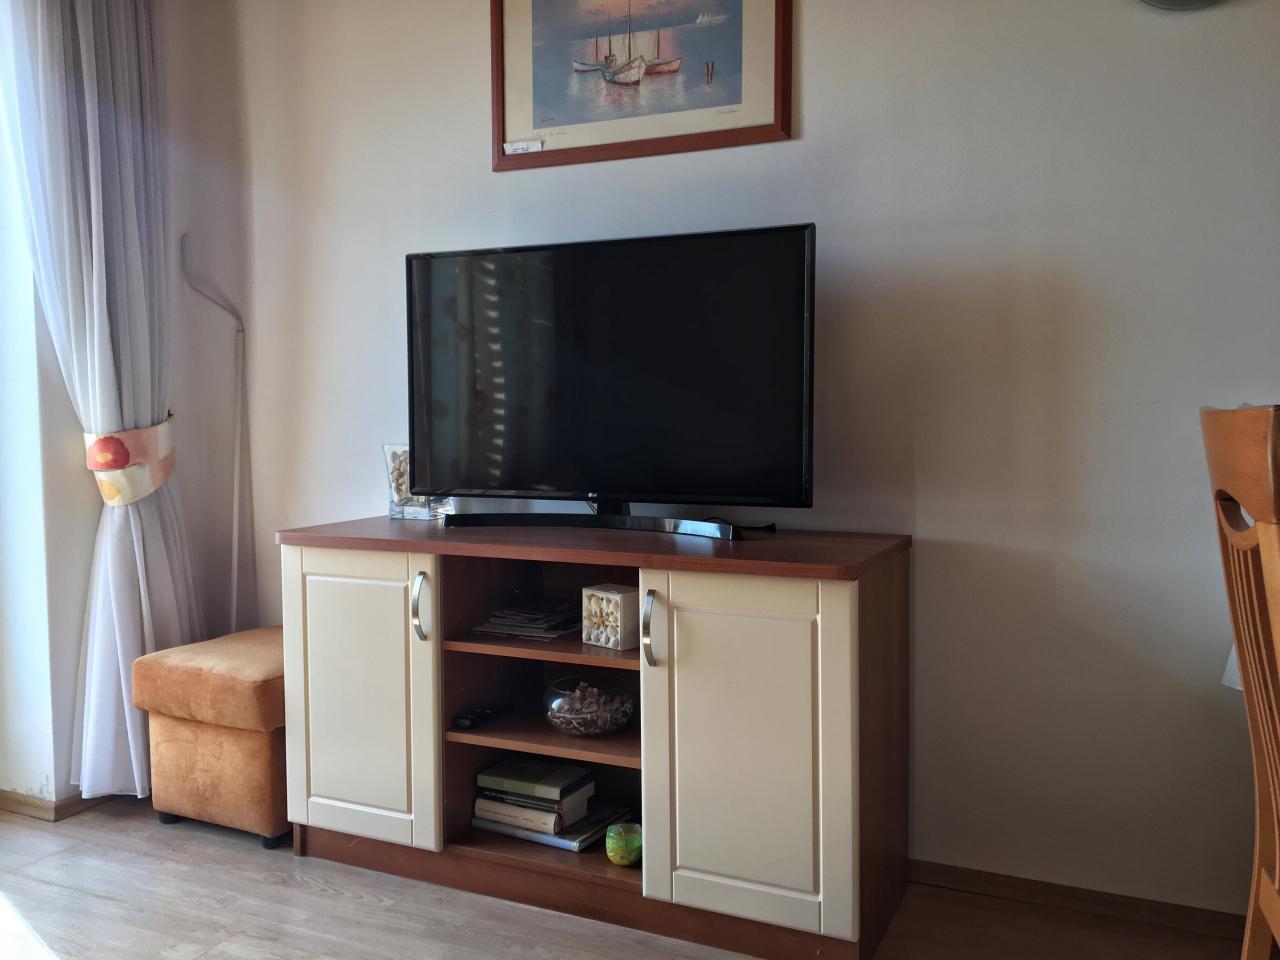 dachgeschosswohnung f r 4 5 pers nur 20 vom meer entfernt objekt nr 17481. Black Bedroom Furniture Sets. Home Design Ideas